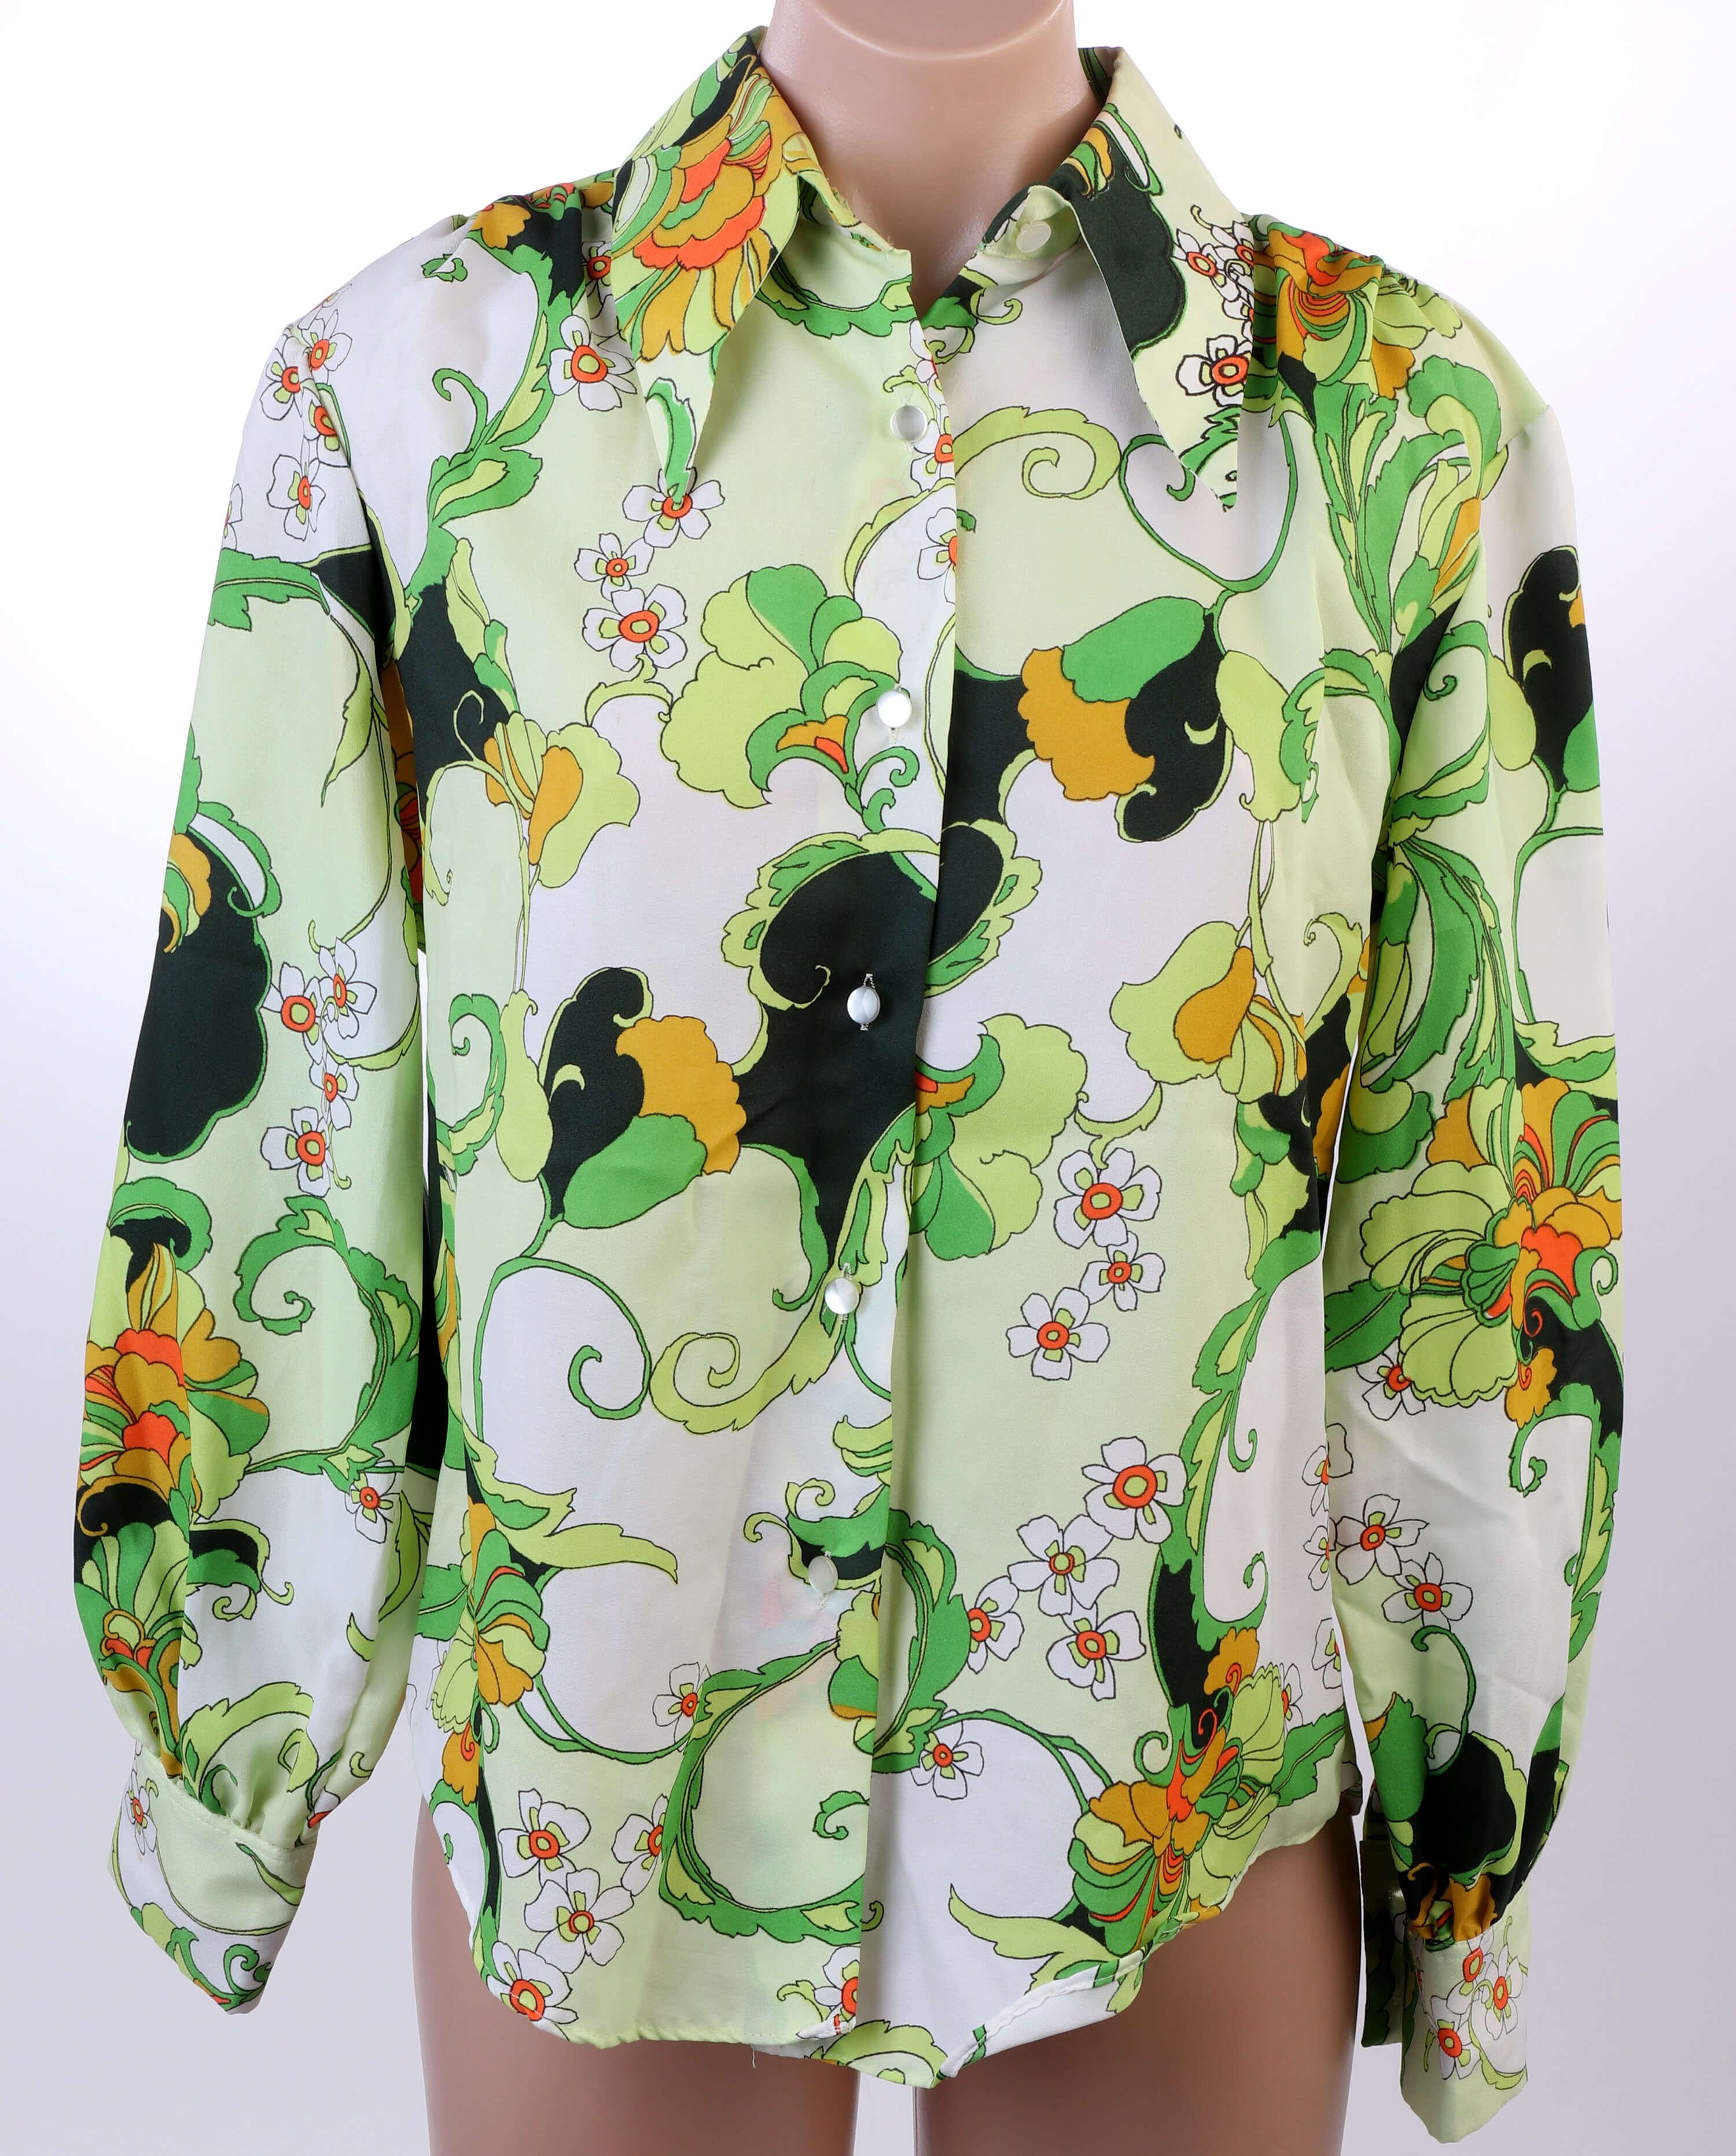 Vintage polyester shirt